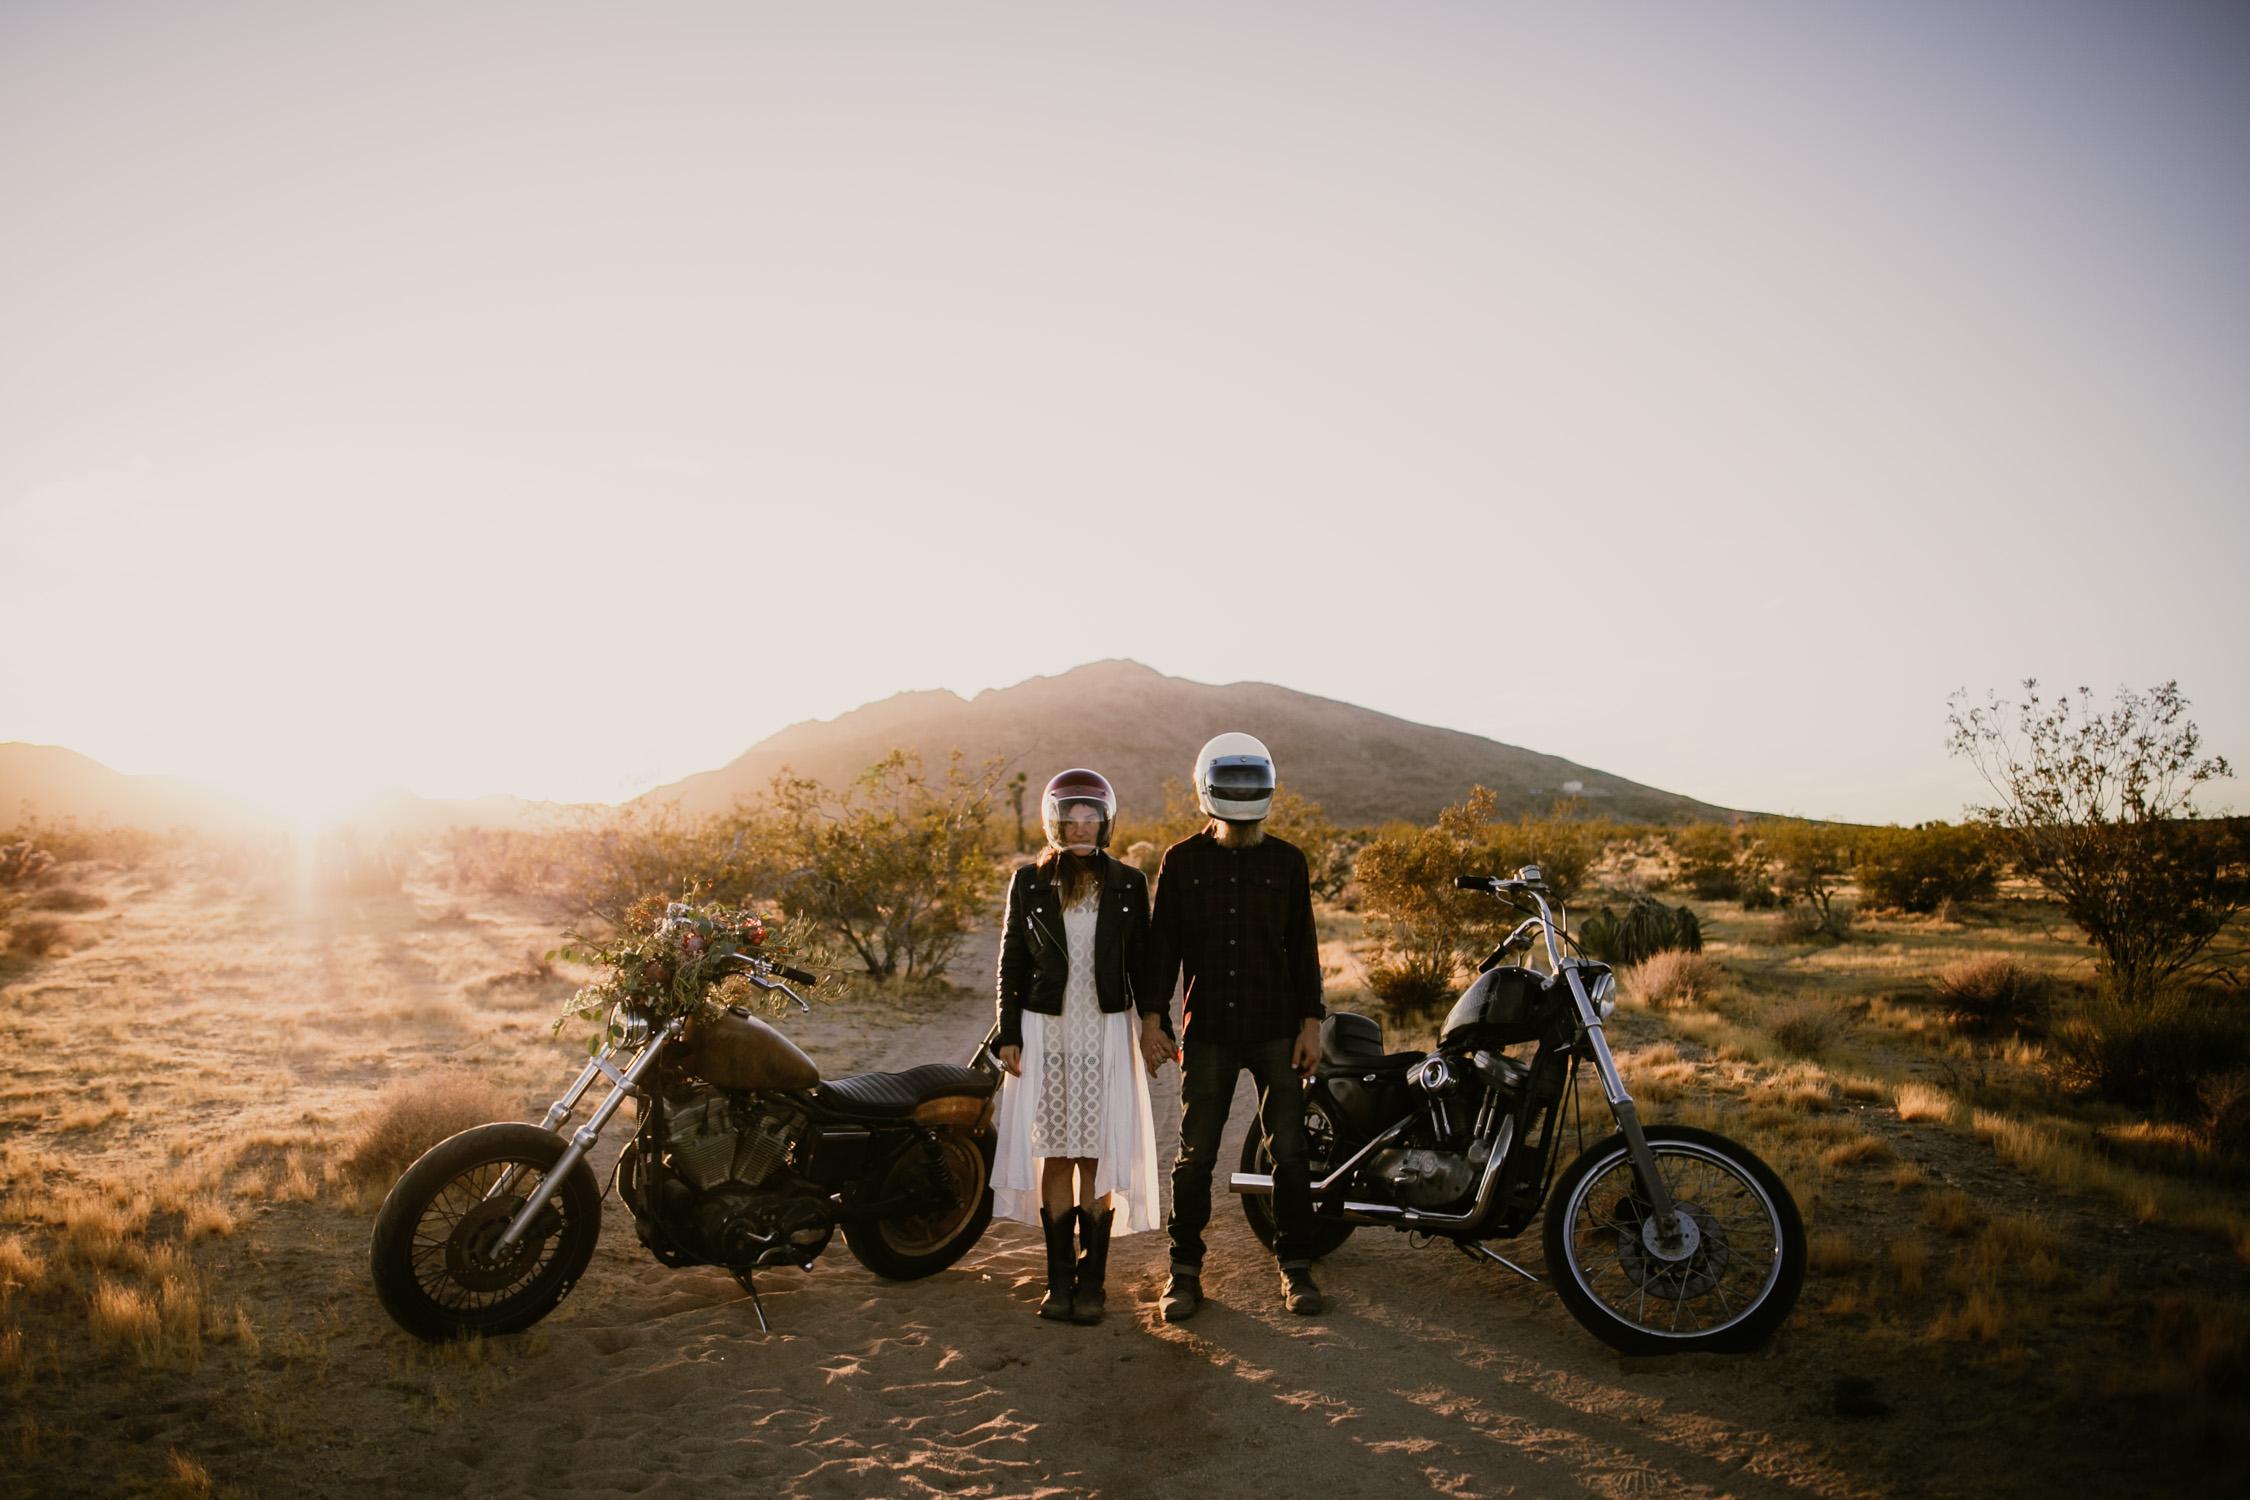 motorcycle-wedding-photos-3.jpg